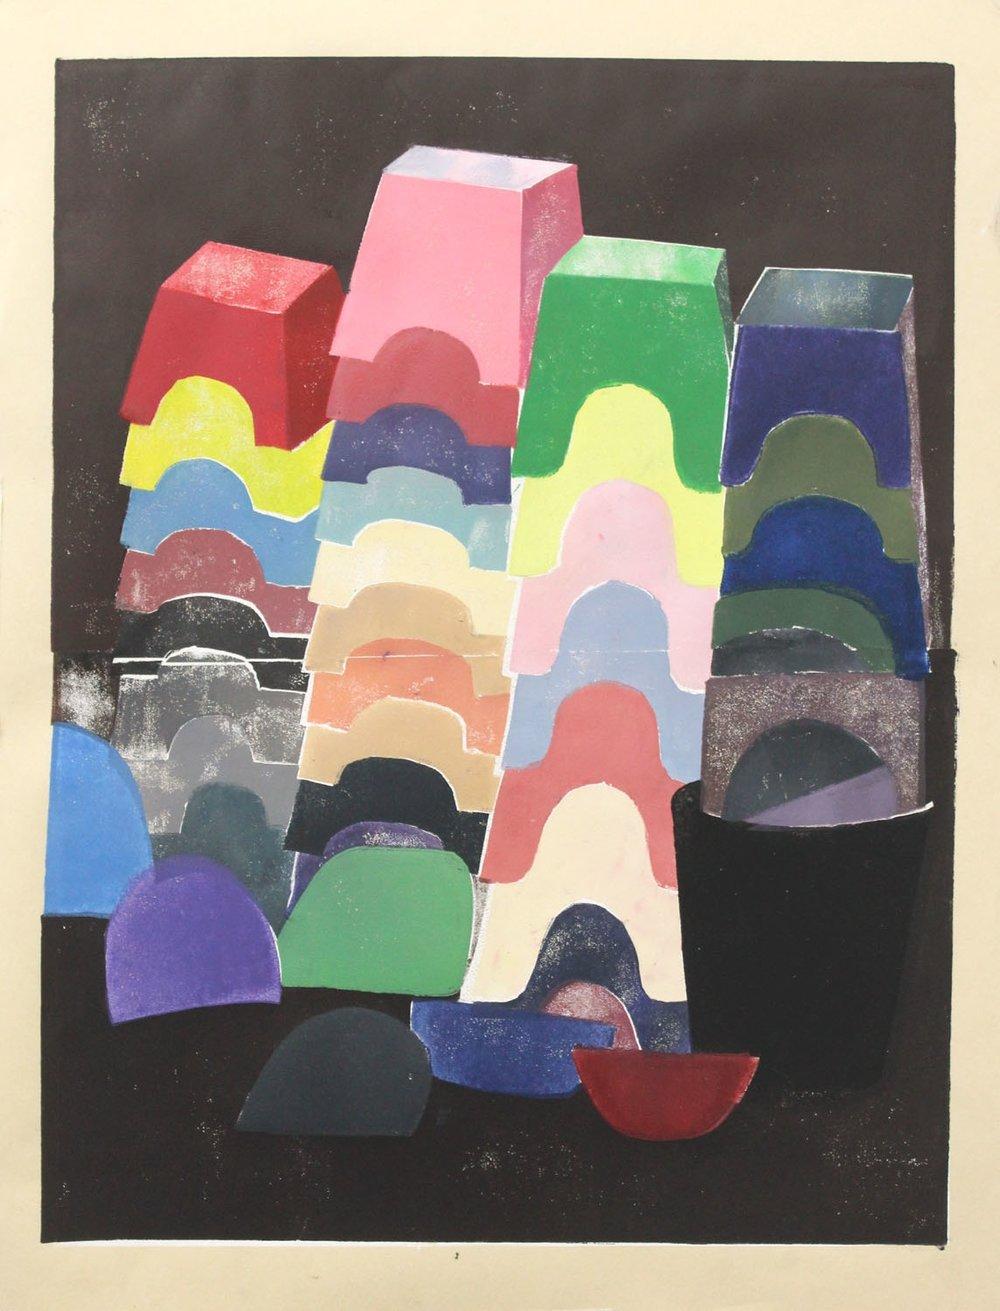 Stacked Stools, Dustpans & Bucket I  2017, Mono print linocut